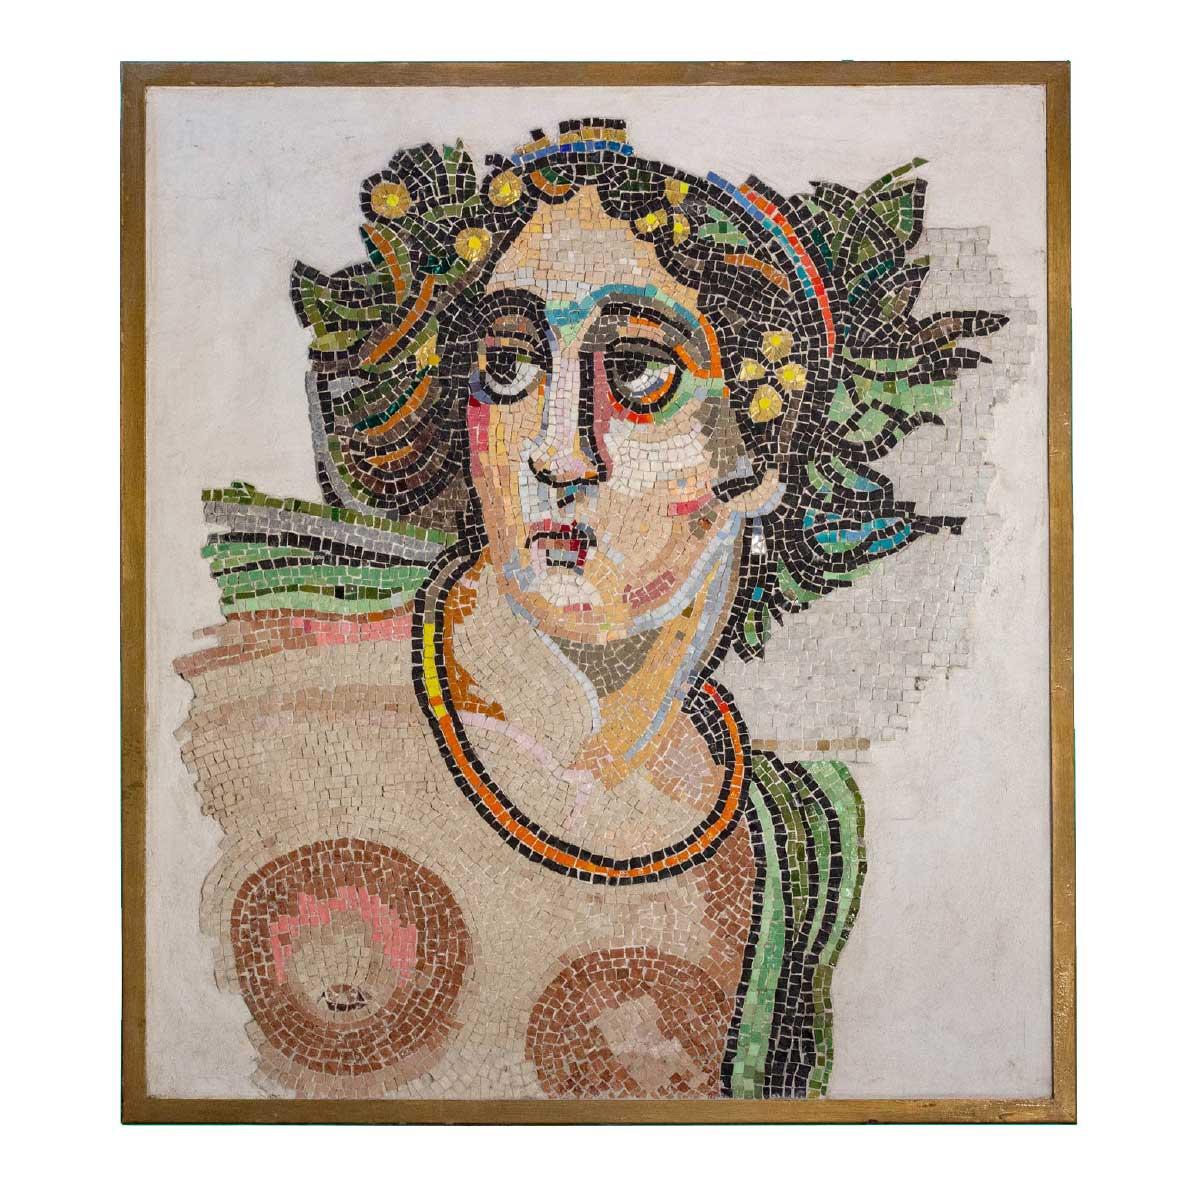 Ursula Corsi Mosaic Roman Pop glasses stones marble wooden frame Italiano Plurale